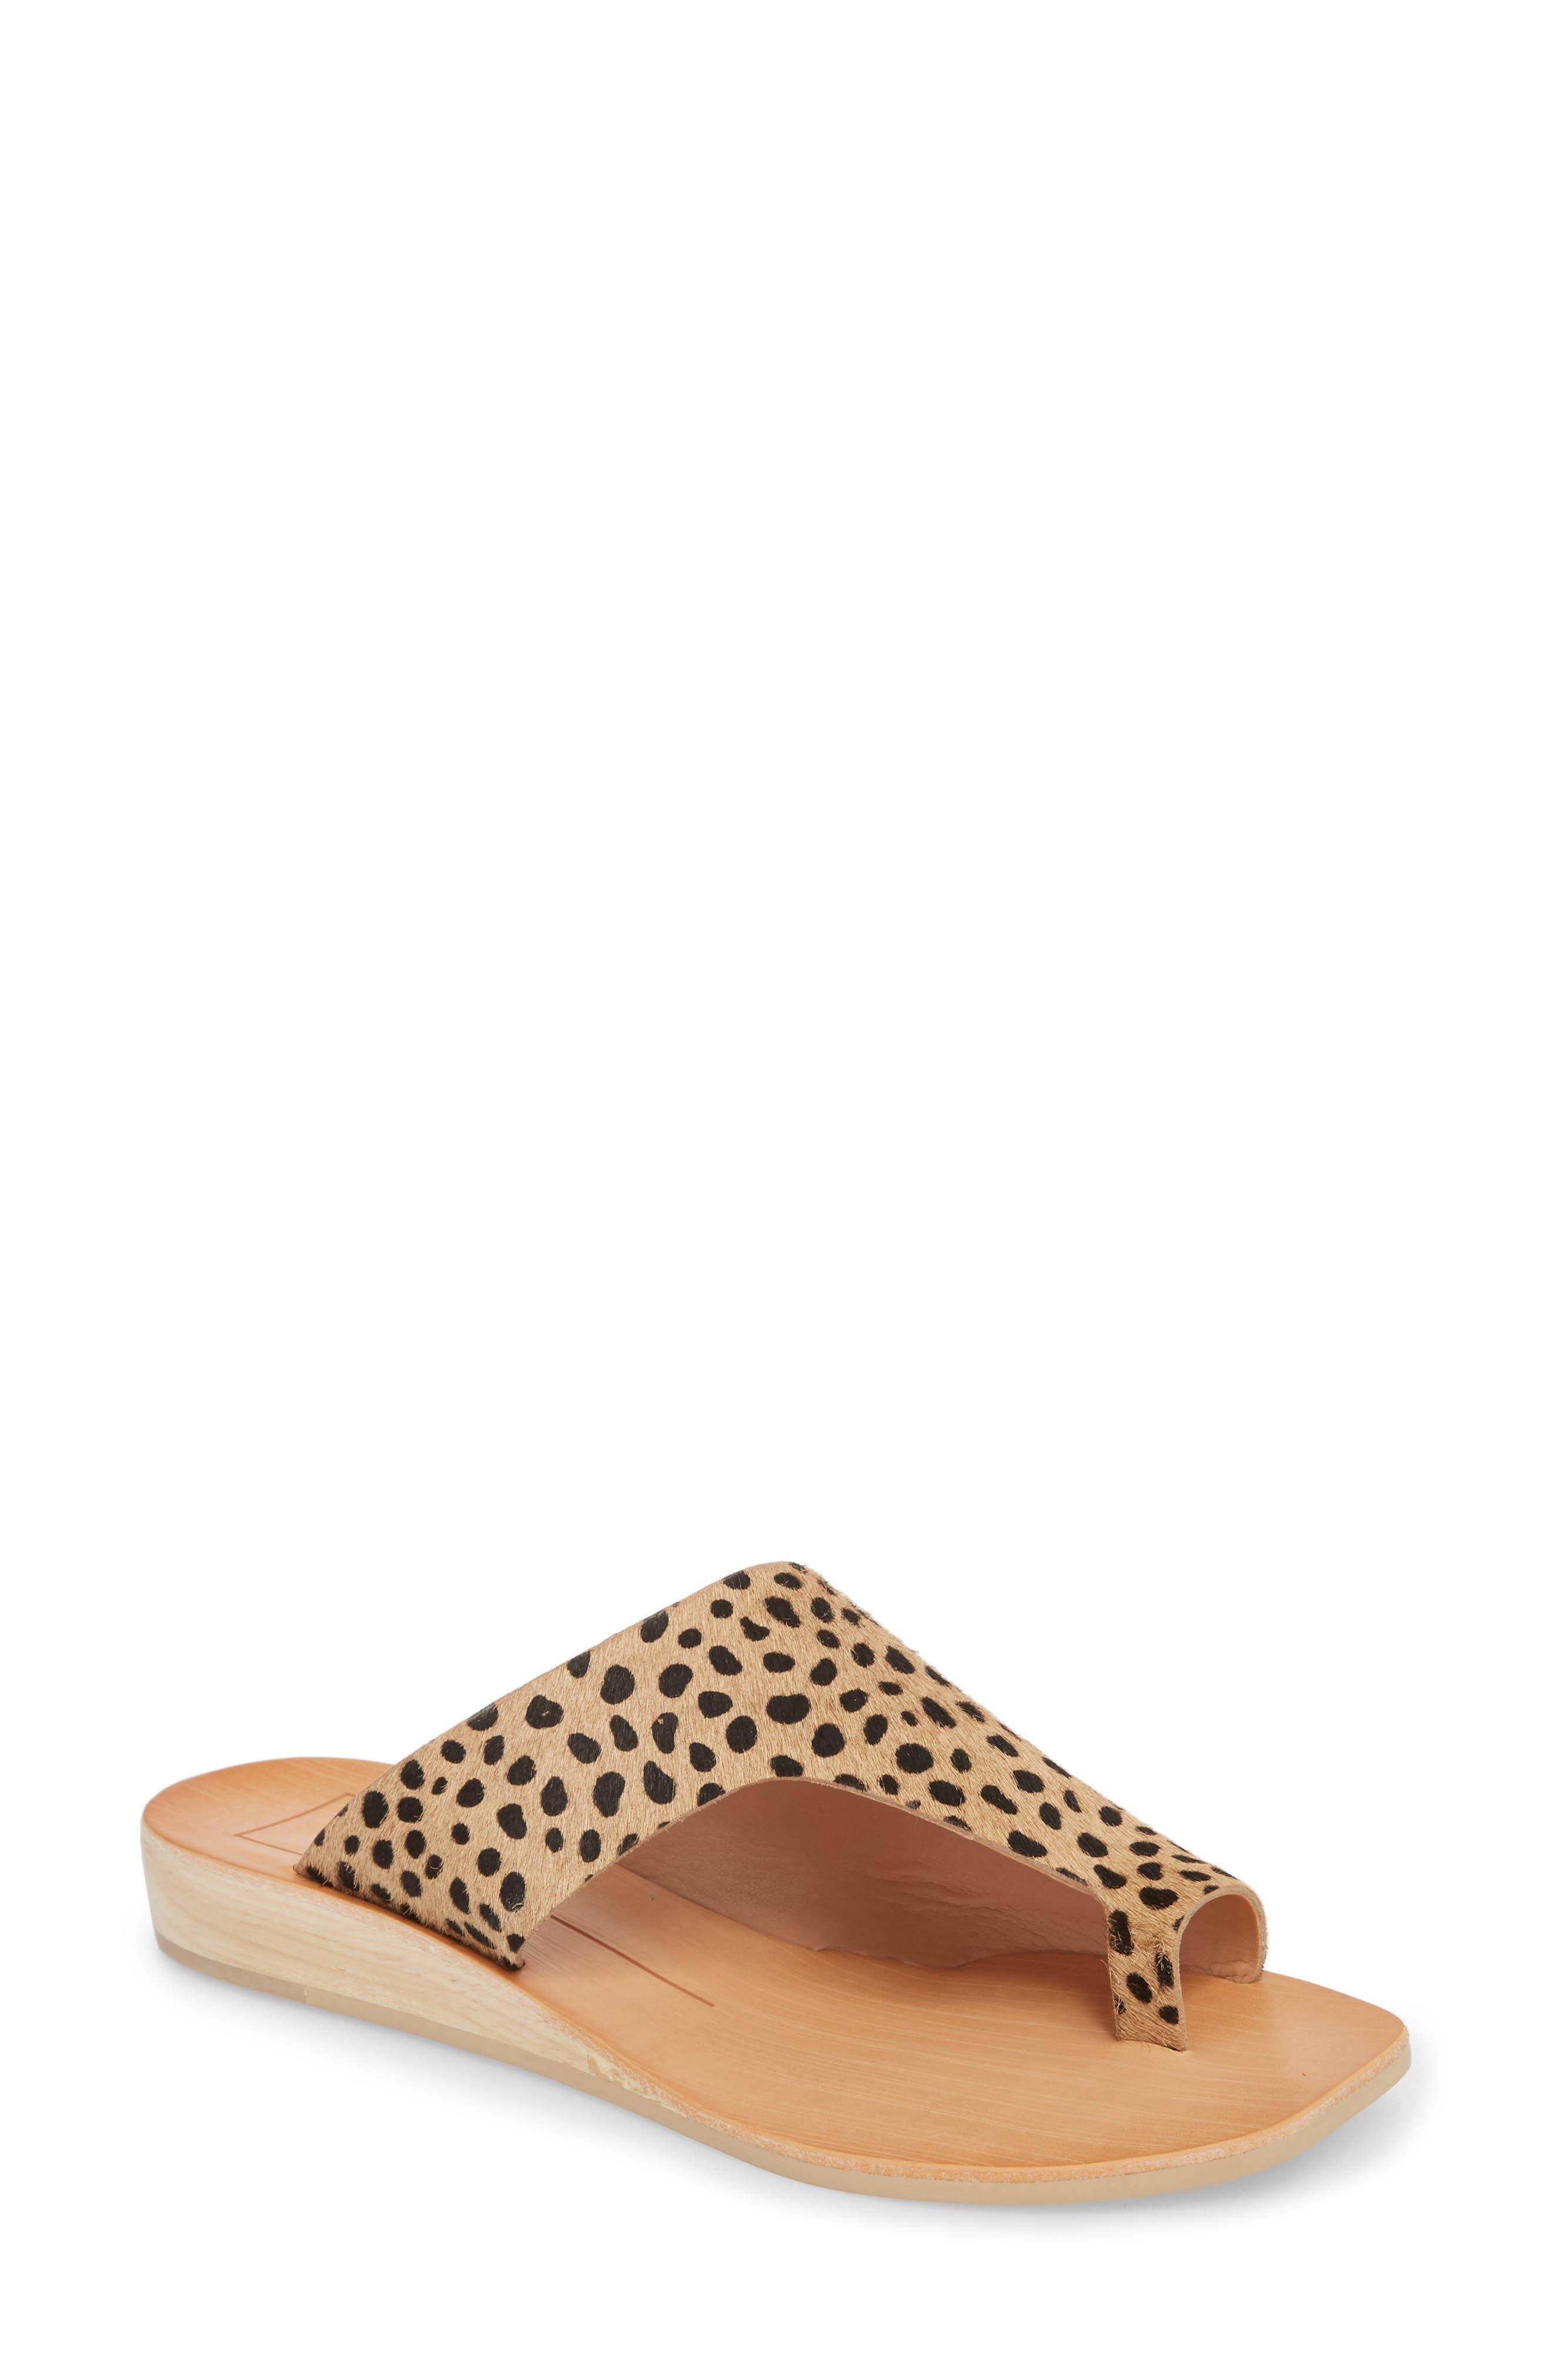 Hazle Genuine Calf Hair Sandal,                             Main thumbnail 1, color,                             Leopard